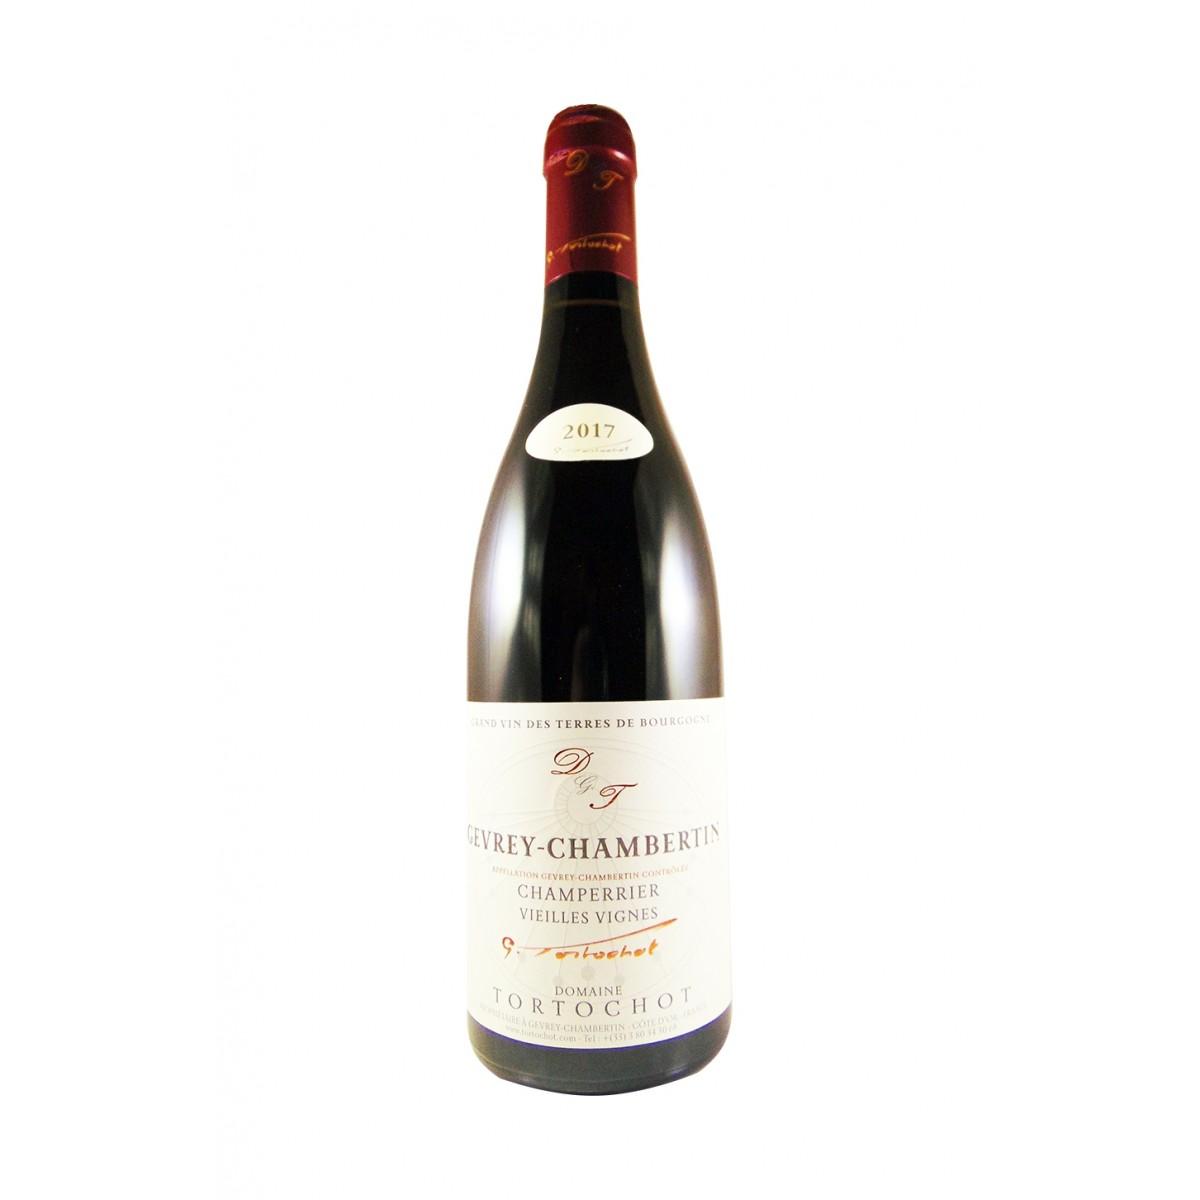 Gevrey Chambertin 1er Cru Champerrier Vieilles Vignes 2017 - Domaine Tortochot